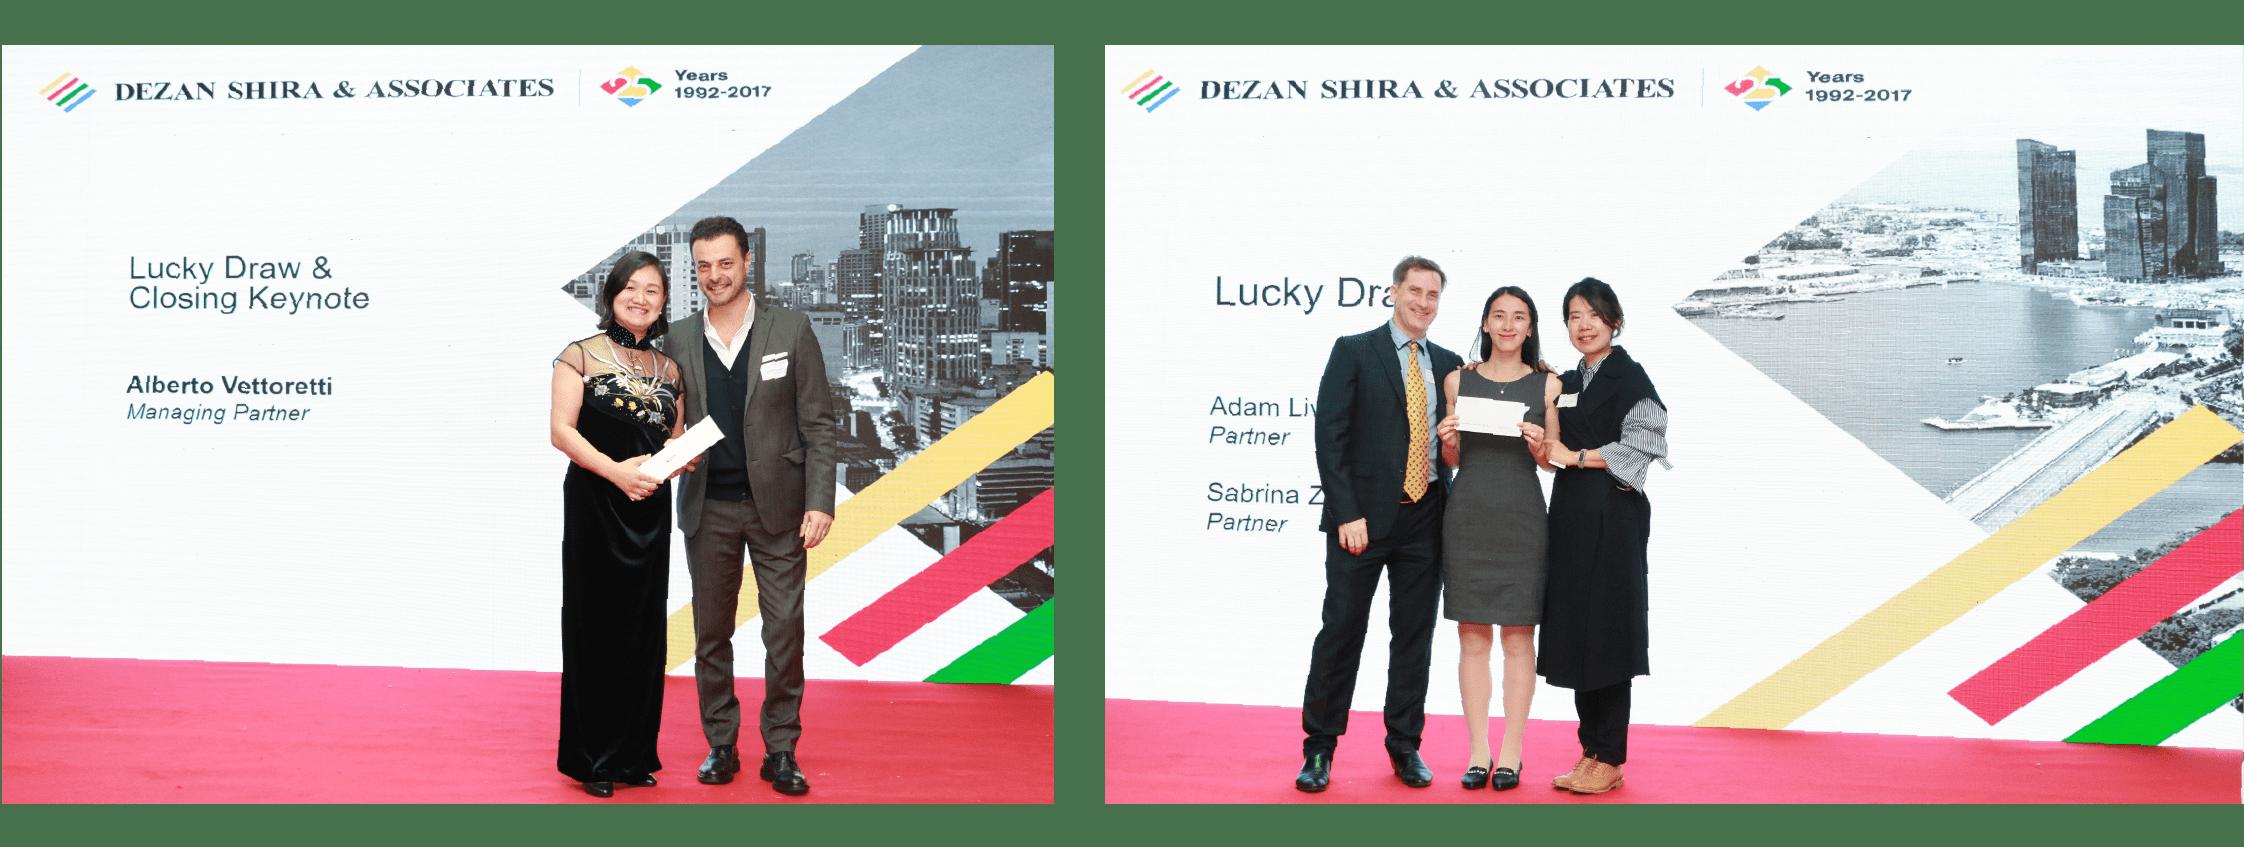 Dezan Shira & Associates' 25th anniversary lucky draw